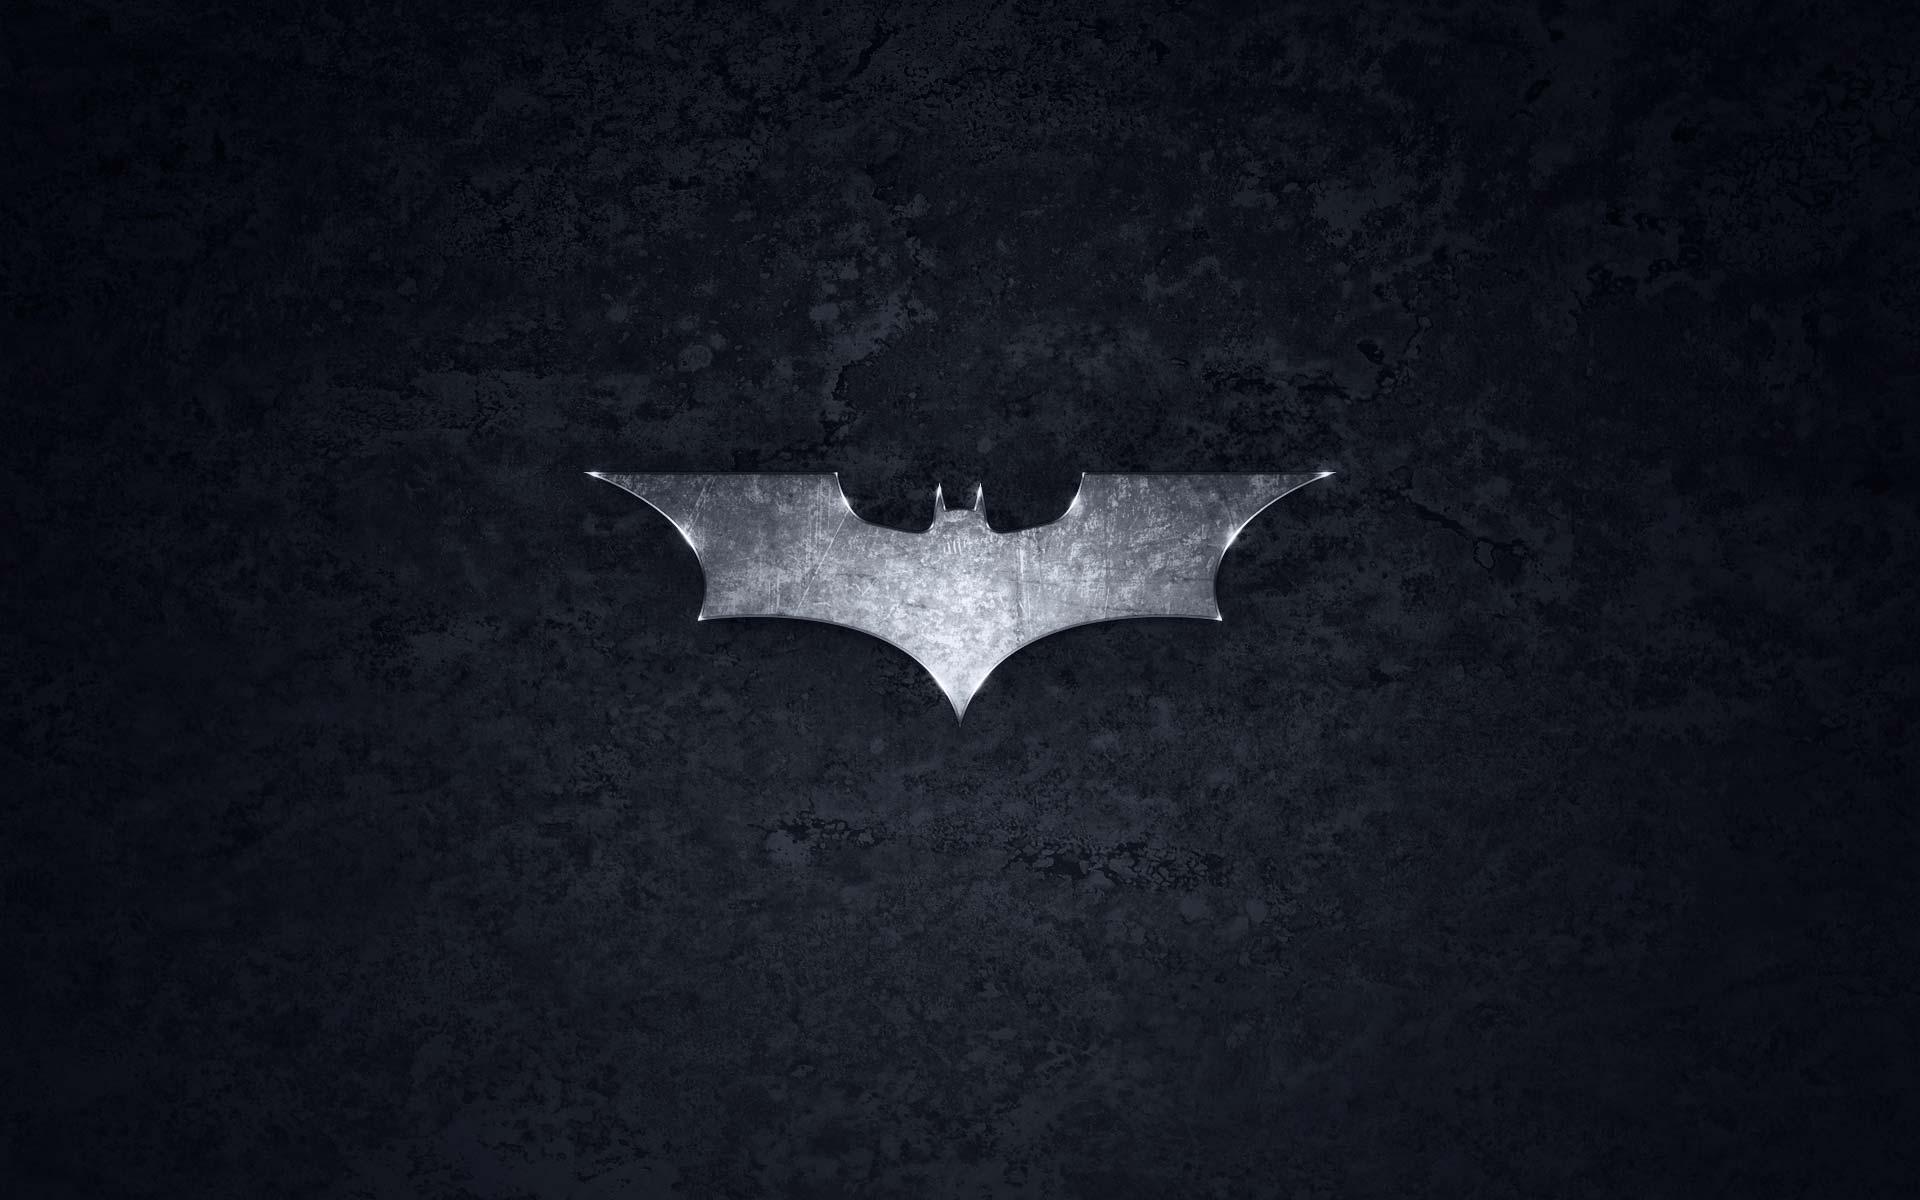 Steel Batman logo Wallpaper   Batman Wallpaper 1920x1200